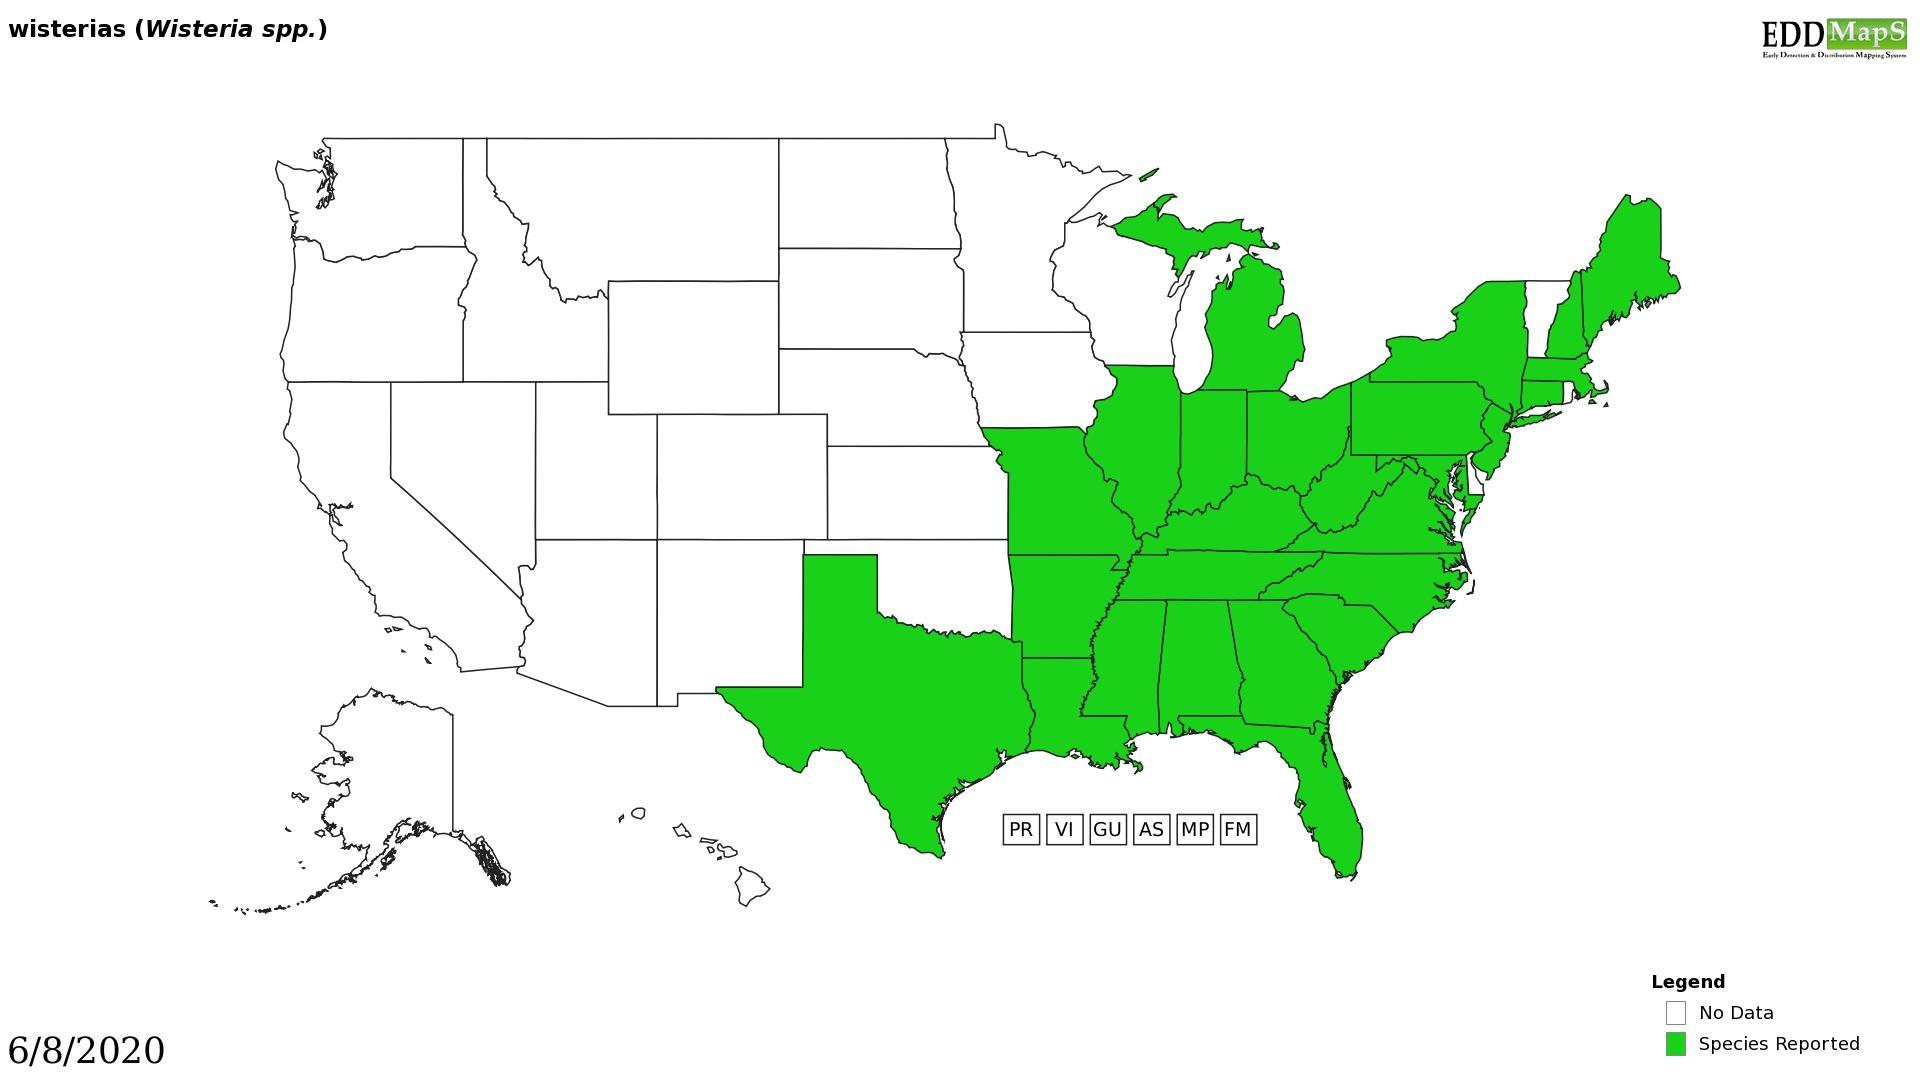 Wisteria distribution - United States